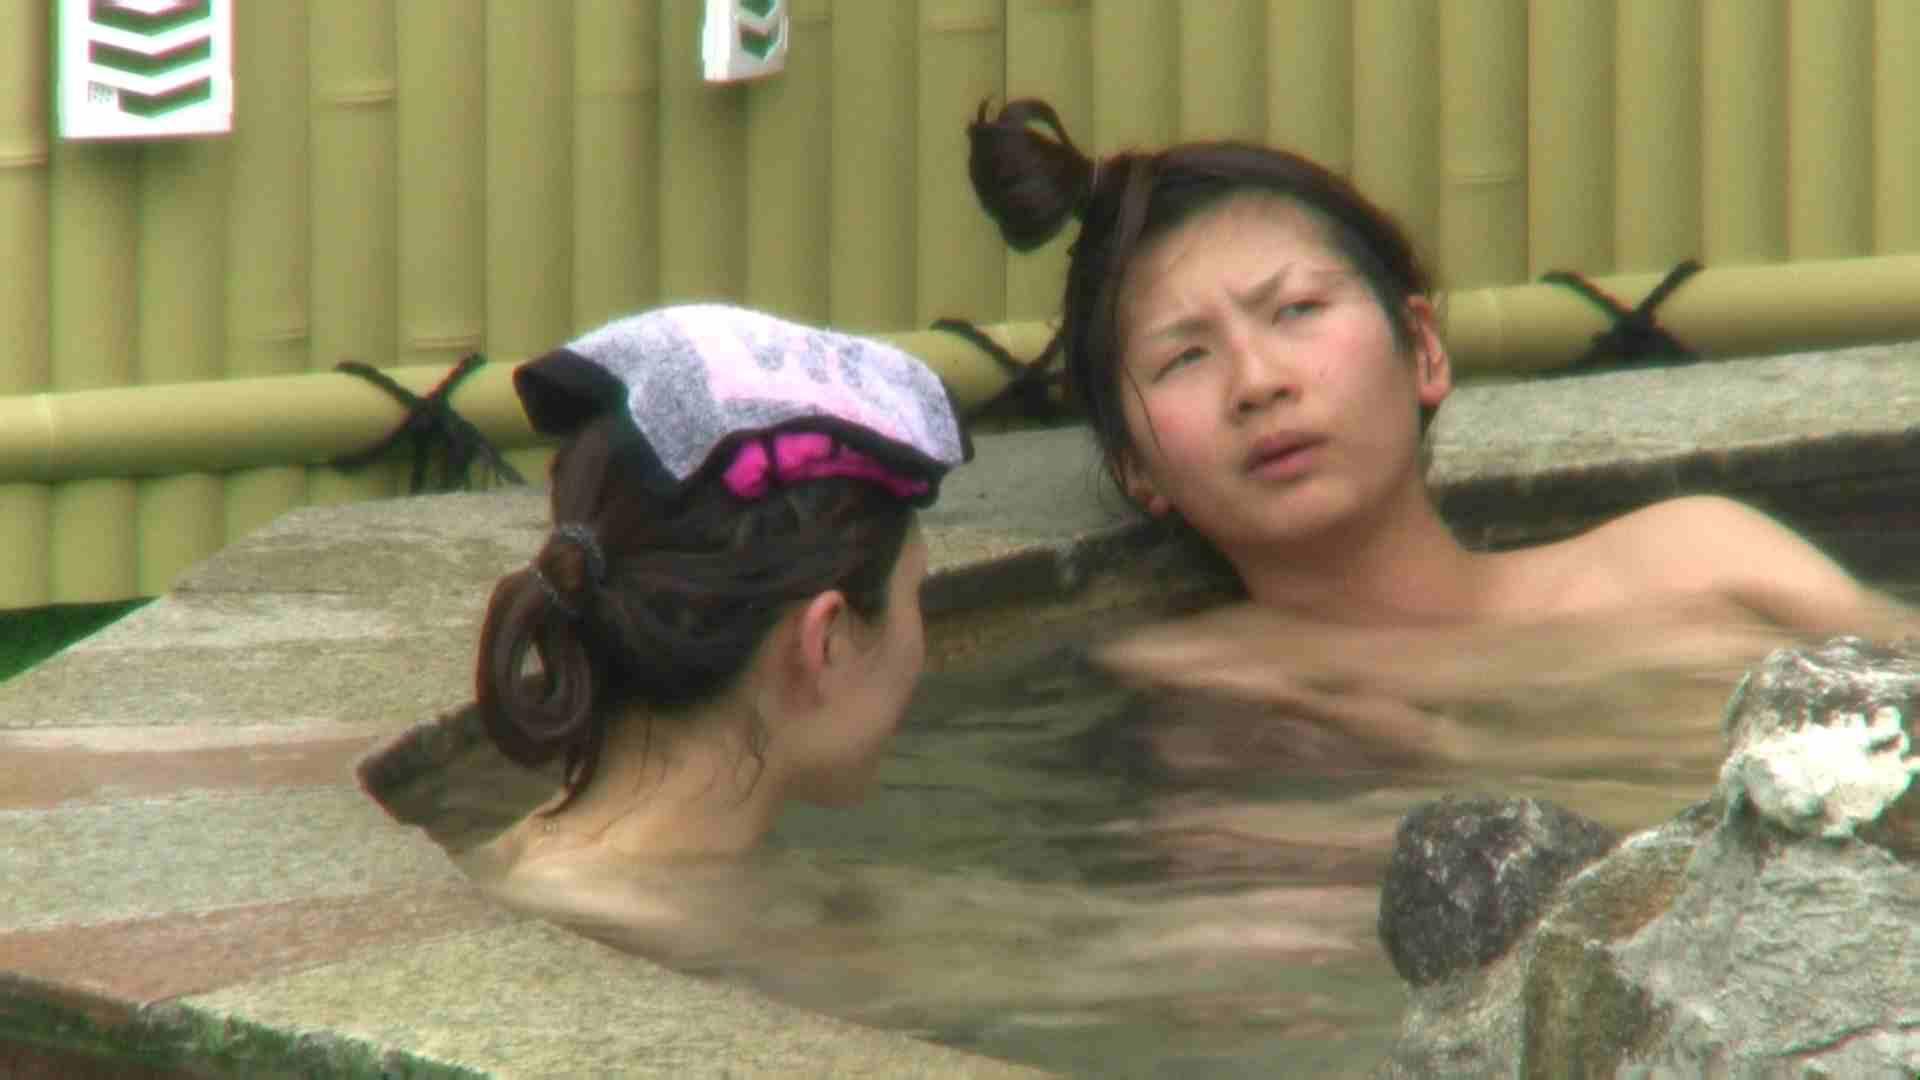 Aquaな露天風呂Vol.66【VIP限定】 OLエロ画像 覗きオメコ動画キャプチャ 74PICs 47